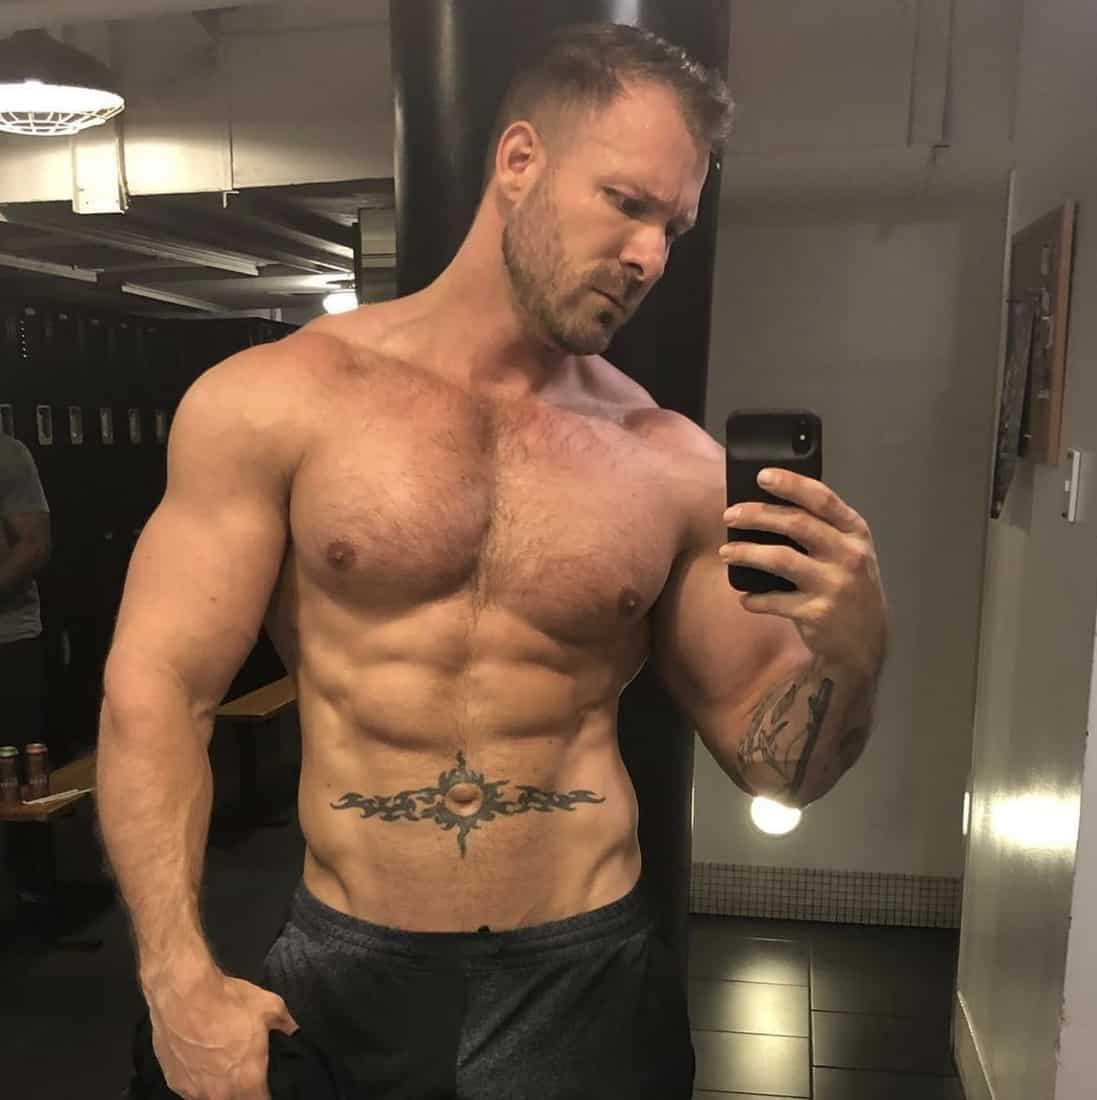 Randy gays hot romping